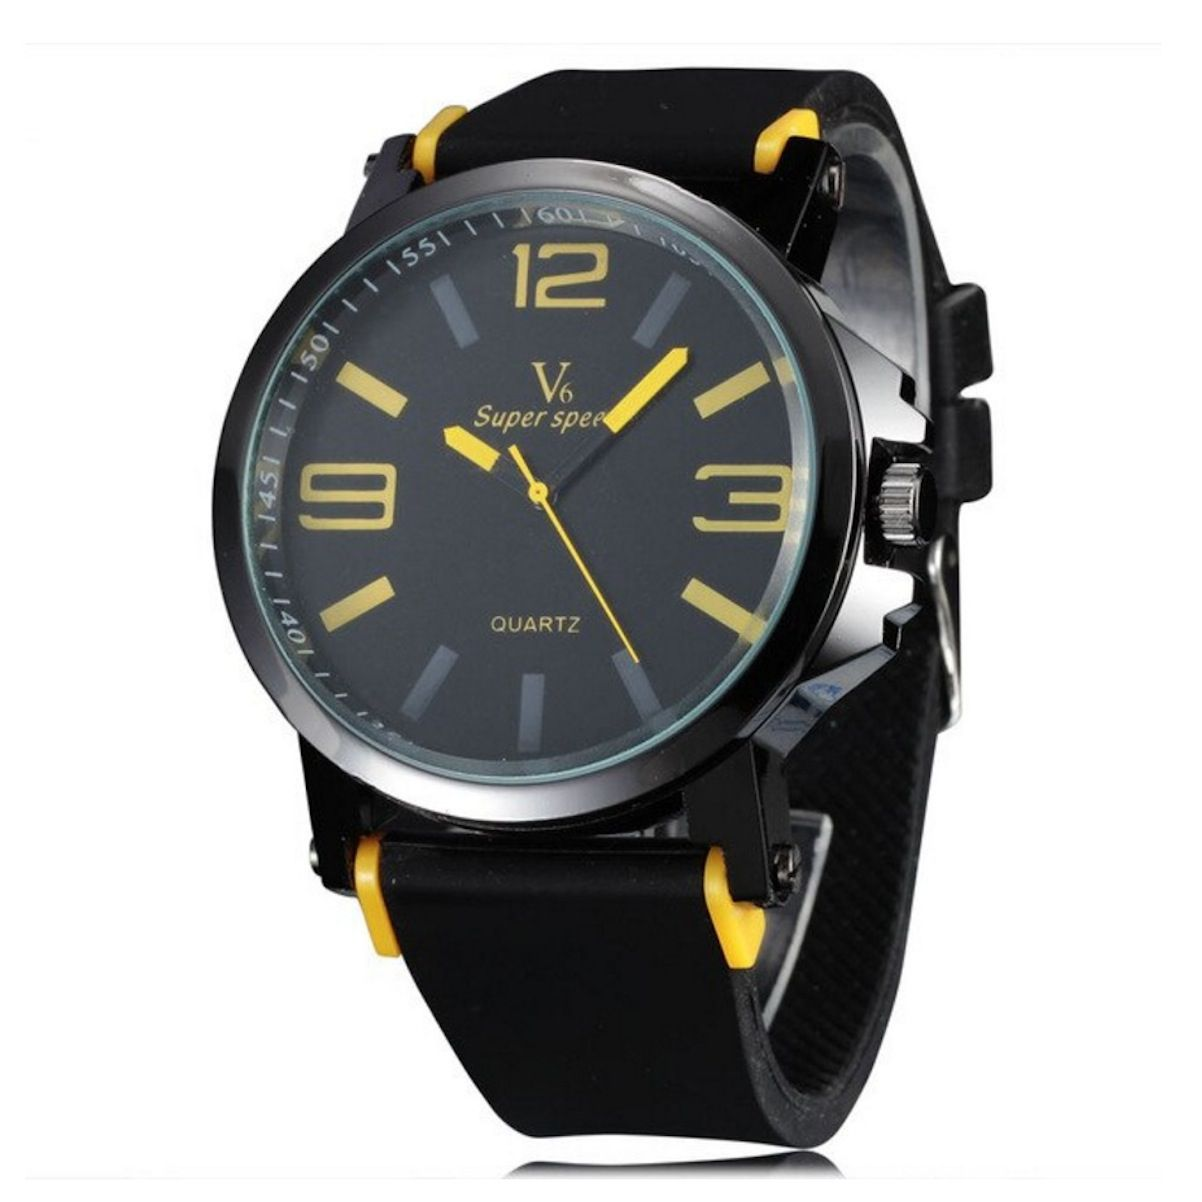 Relógio Masculino Analógico Militar Luxo Esportivo Silicone